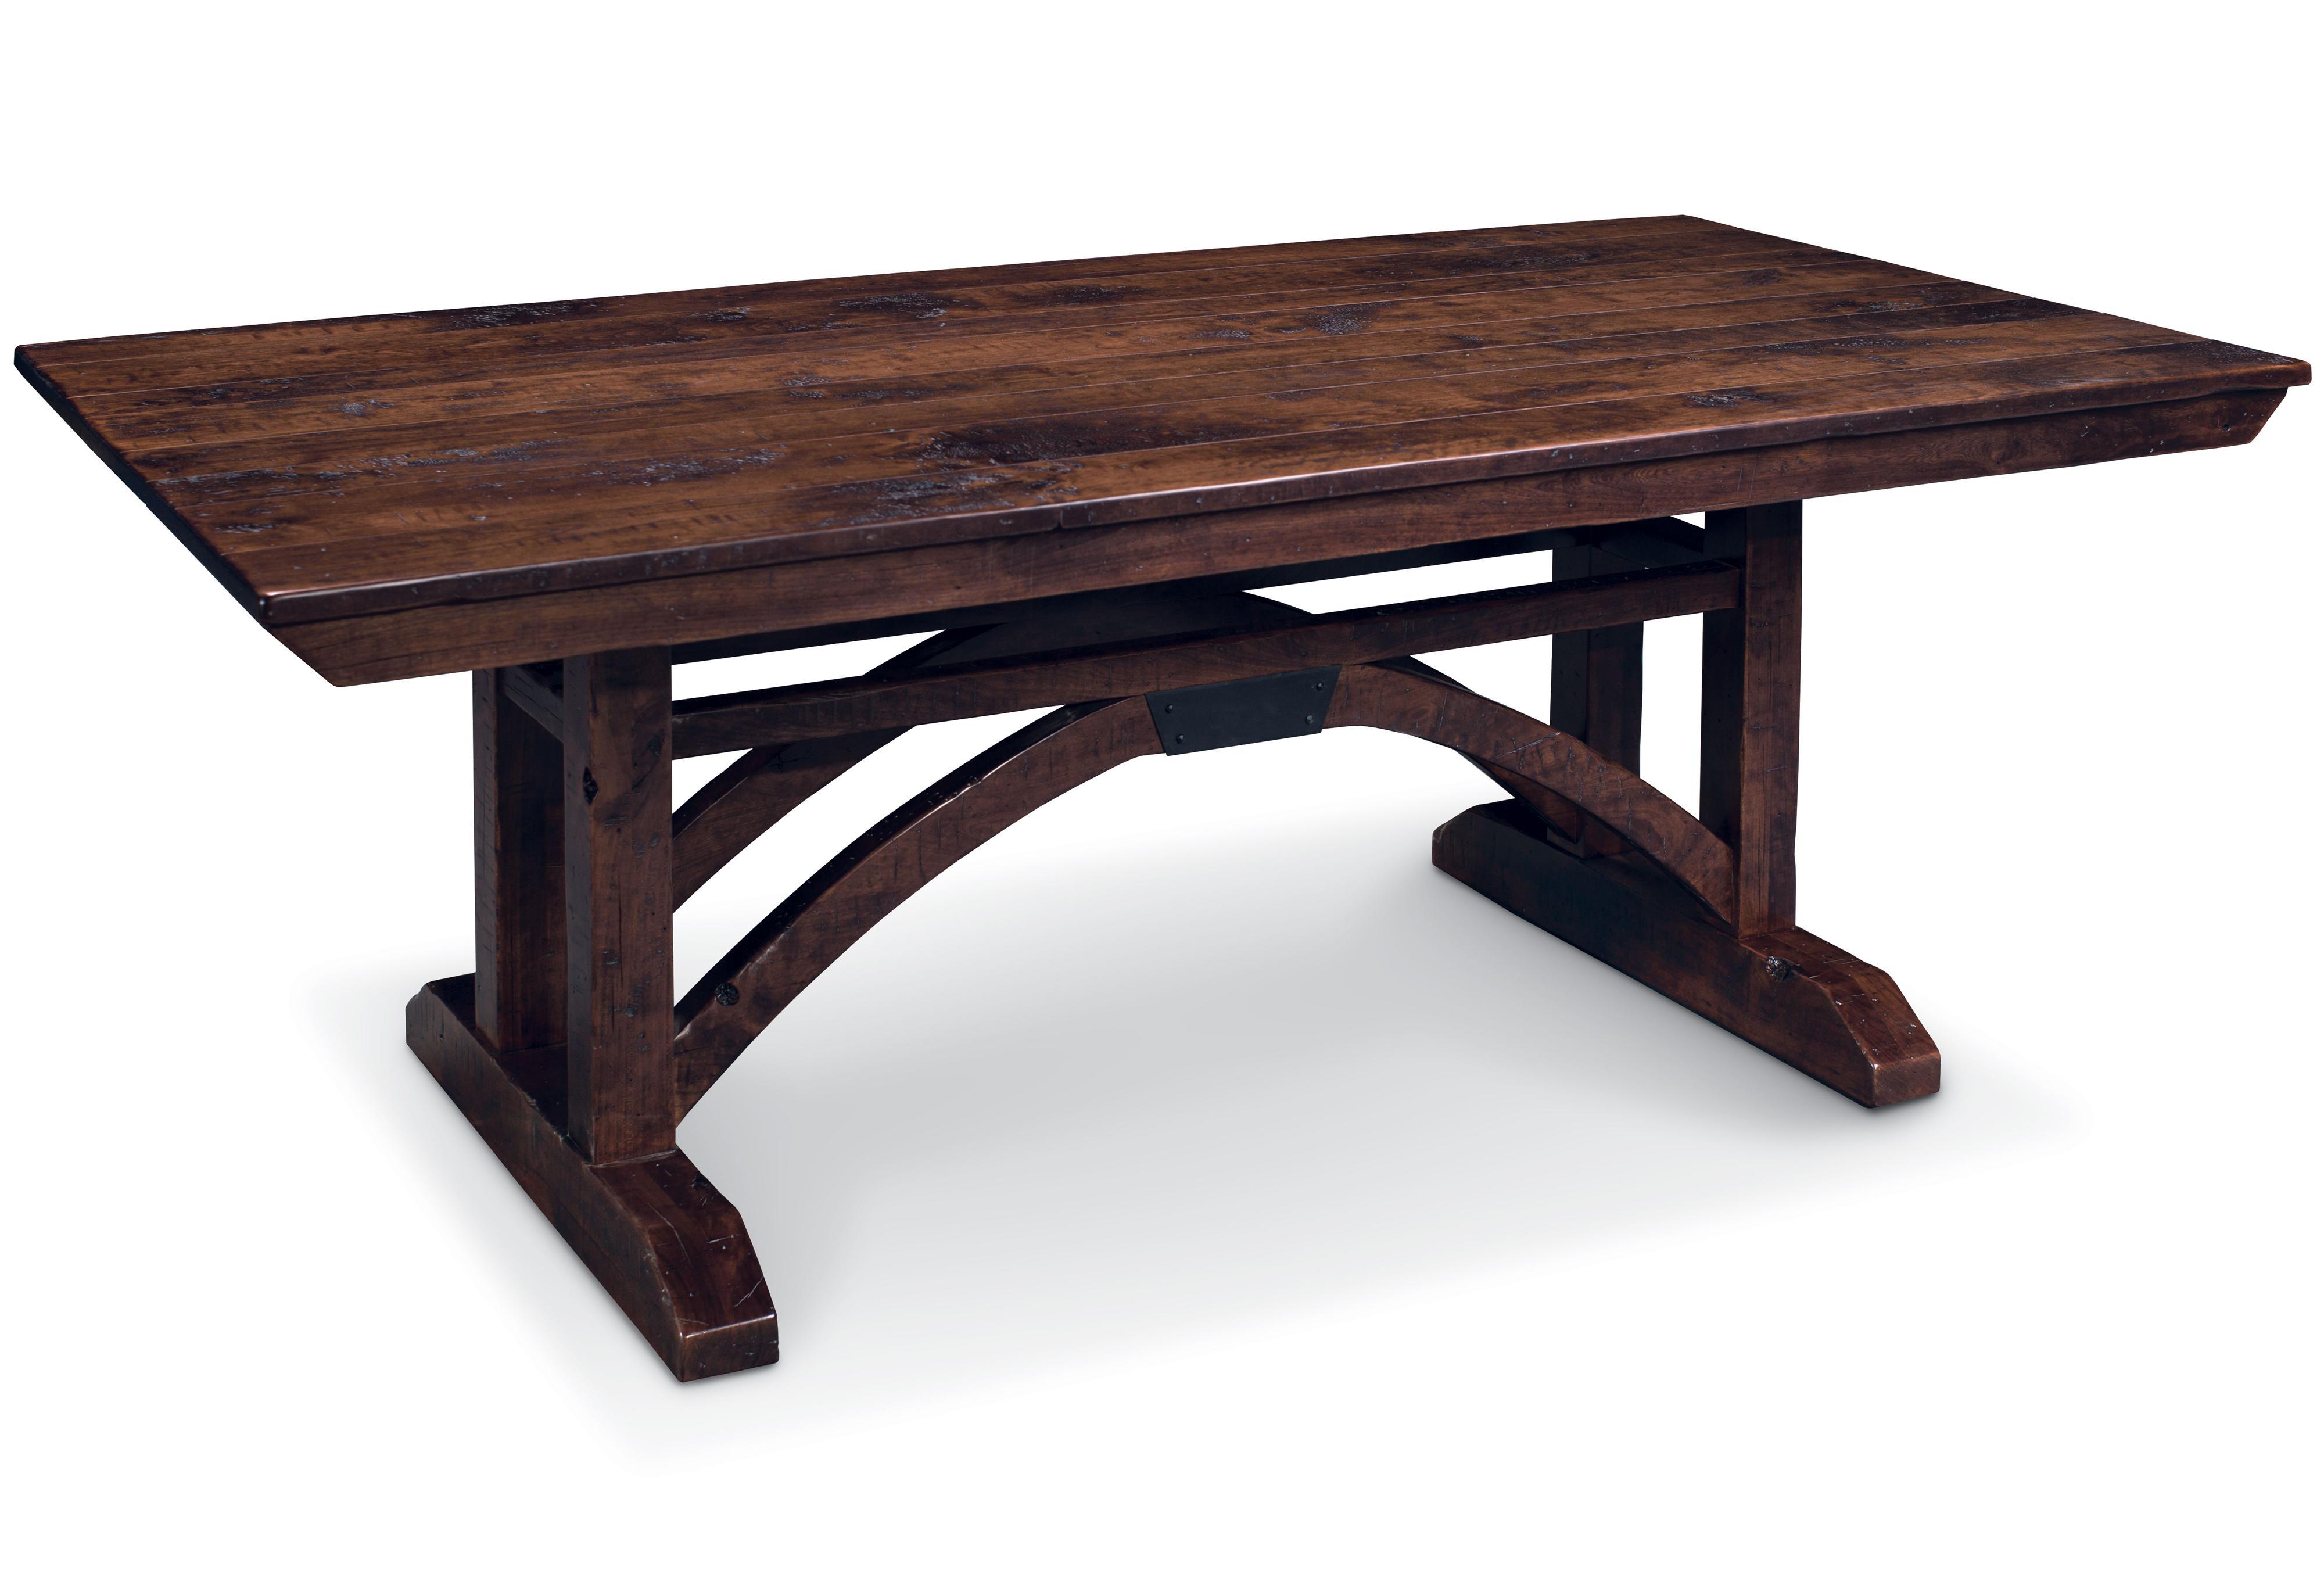 B and O Railroad Trestle Bridge Trestle Table by Simply Amish at O'Dunk & O'Bright Furniture